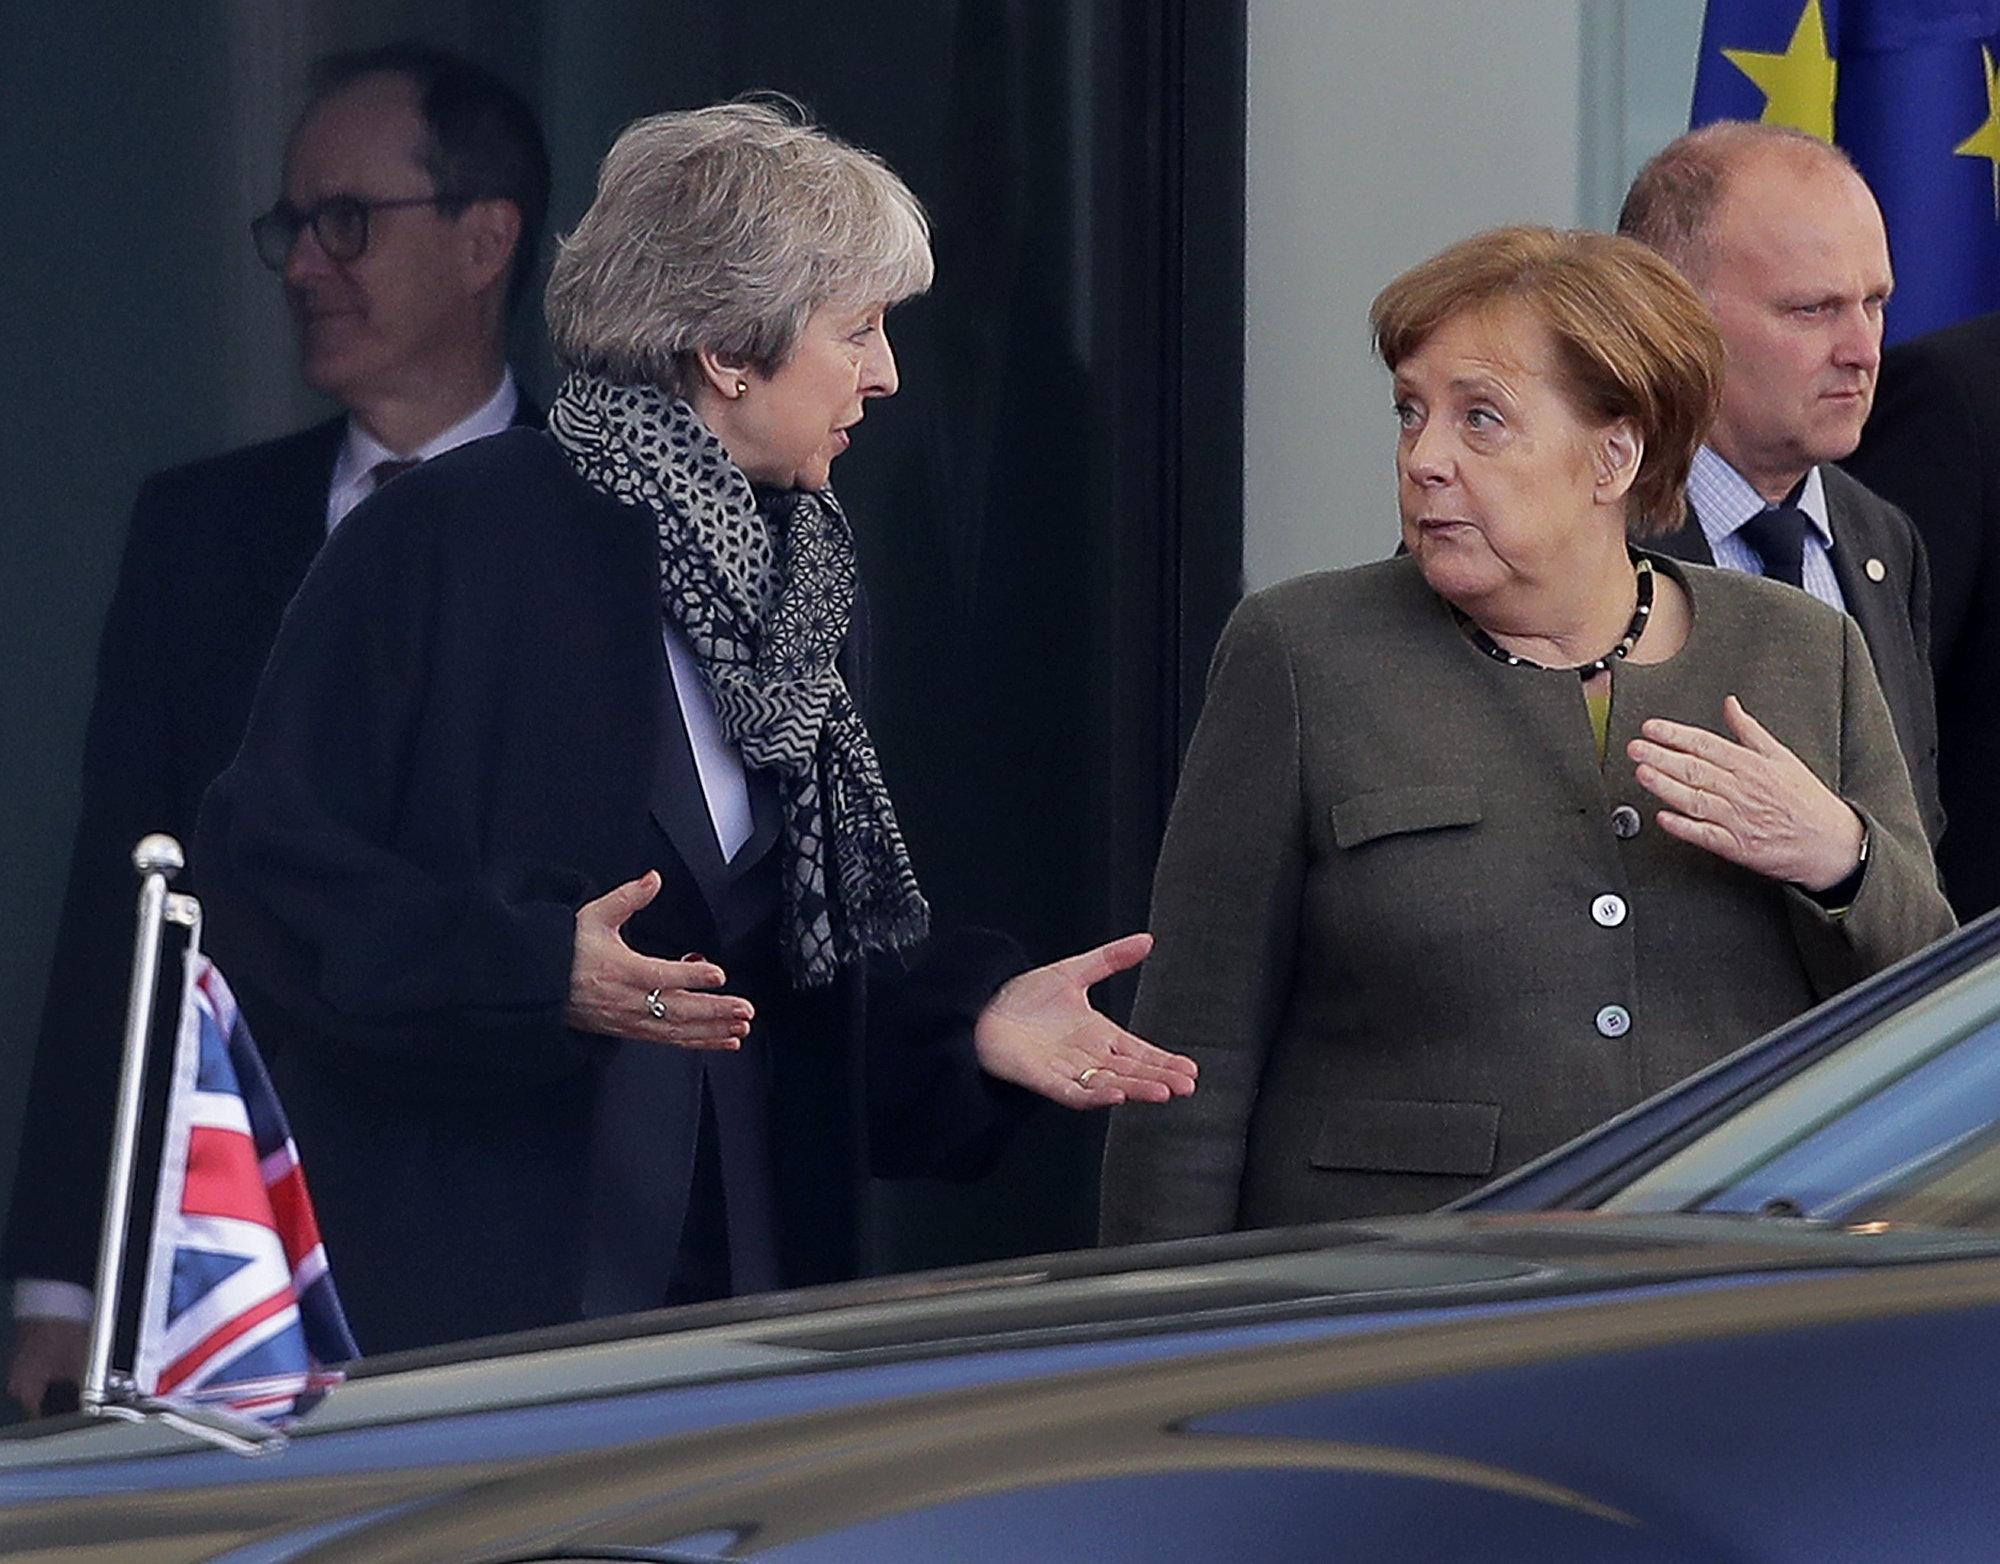 Brexit: Η ΕΕ απαιτεί «ξεκάθαρο» βρετανικό σχέδιο για να δώσει